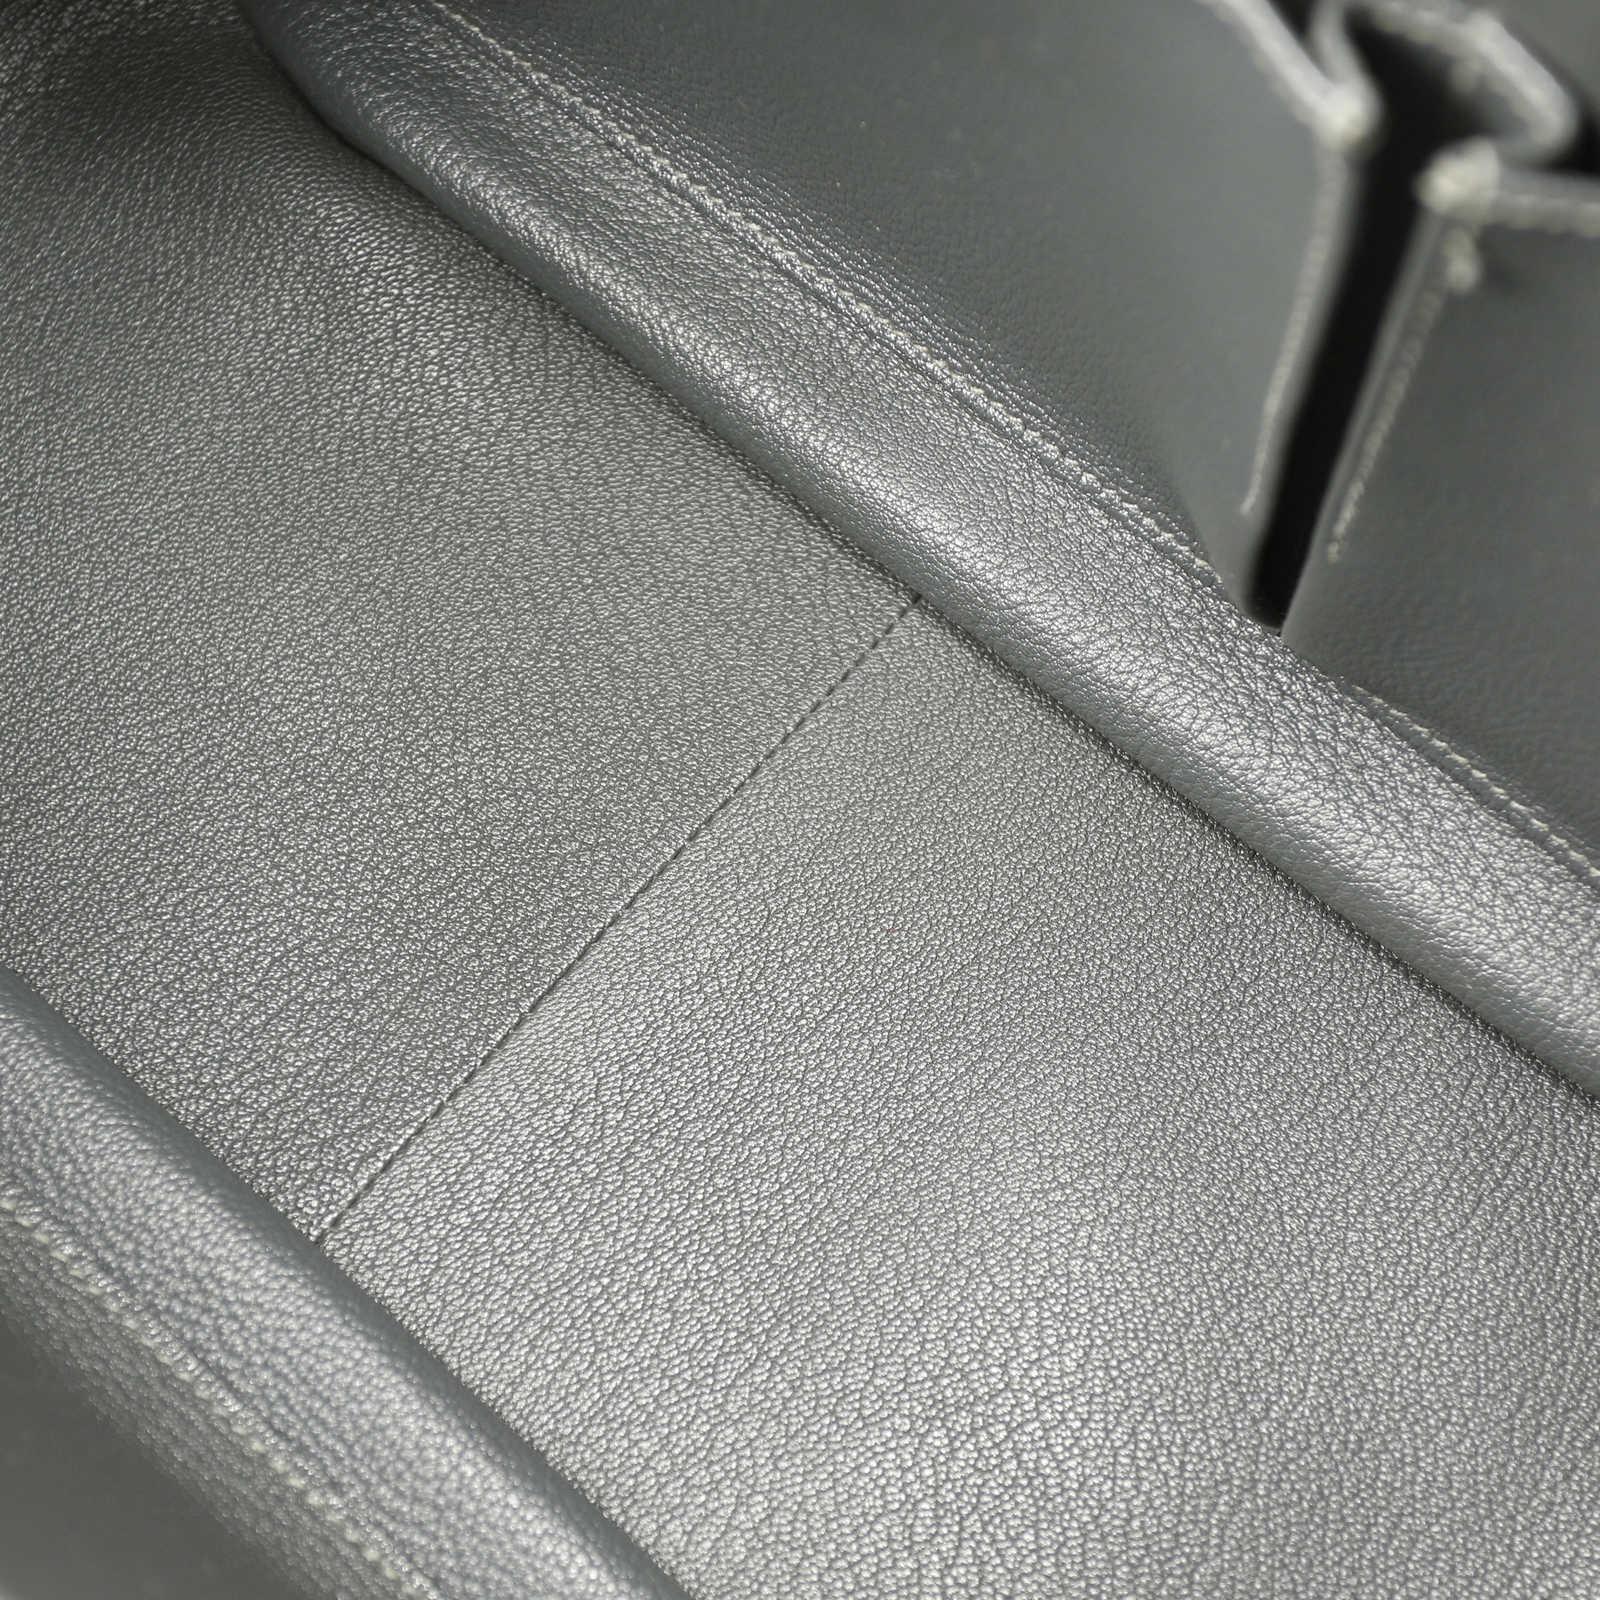 629f79717a8a ... Authentic Second Hand Hermès Jypsière 34 Taurillon Clemence Graphite  (PSS-051-00011) ...